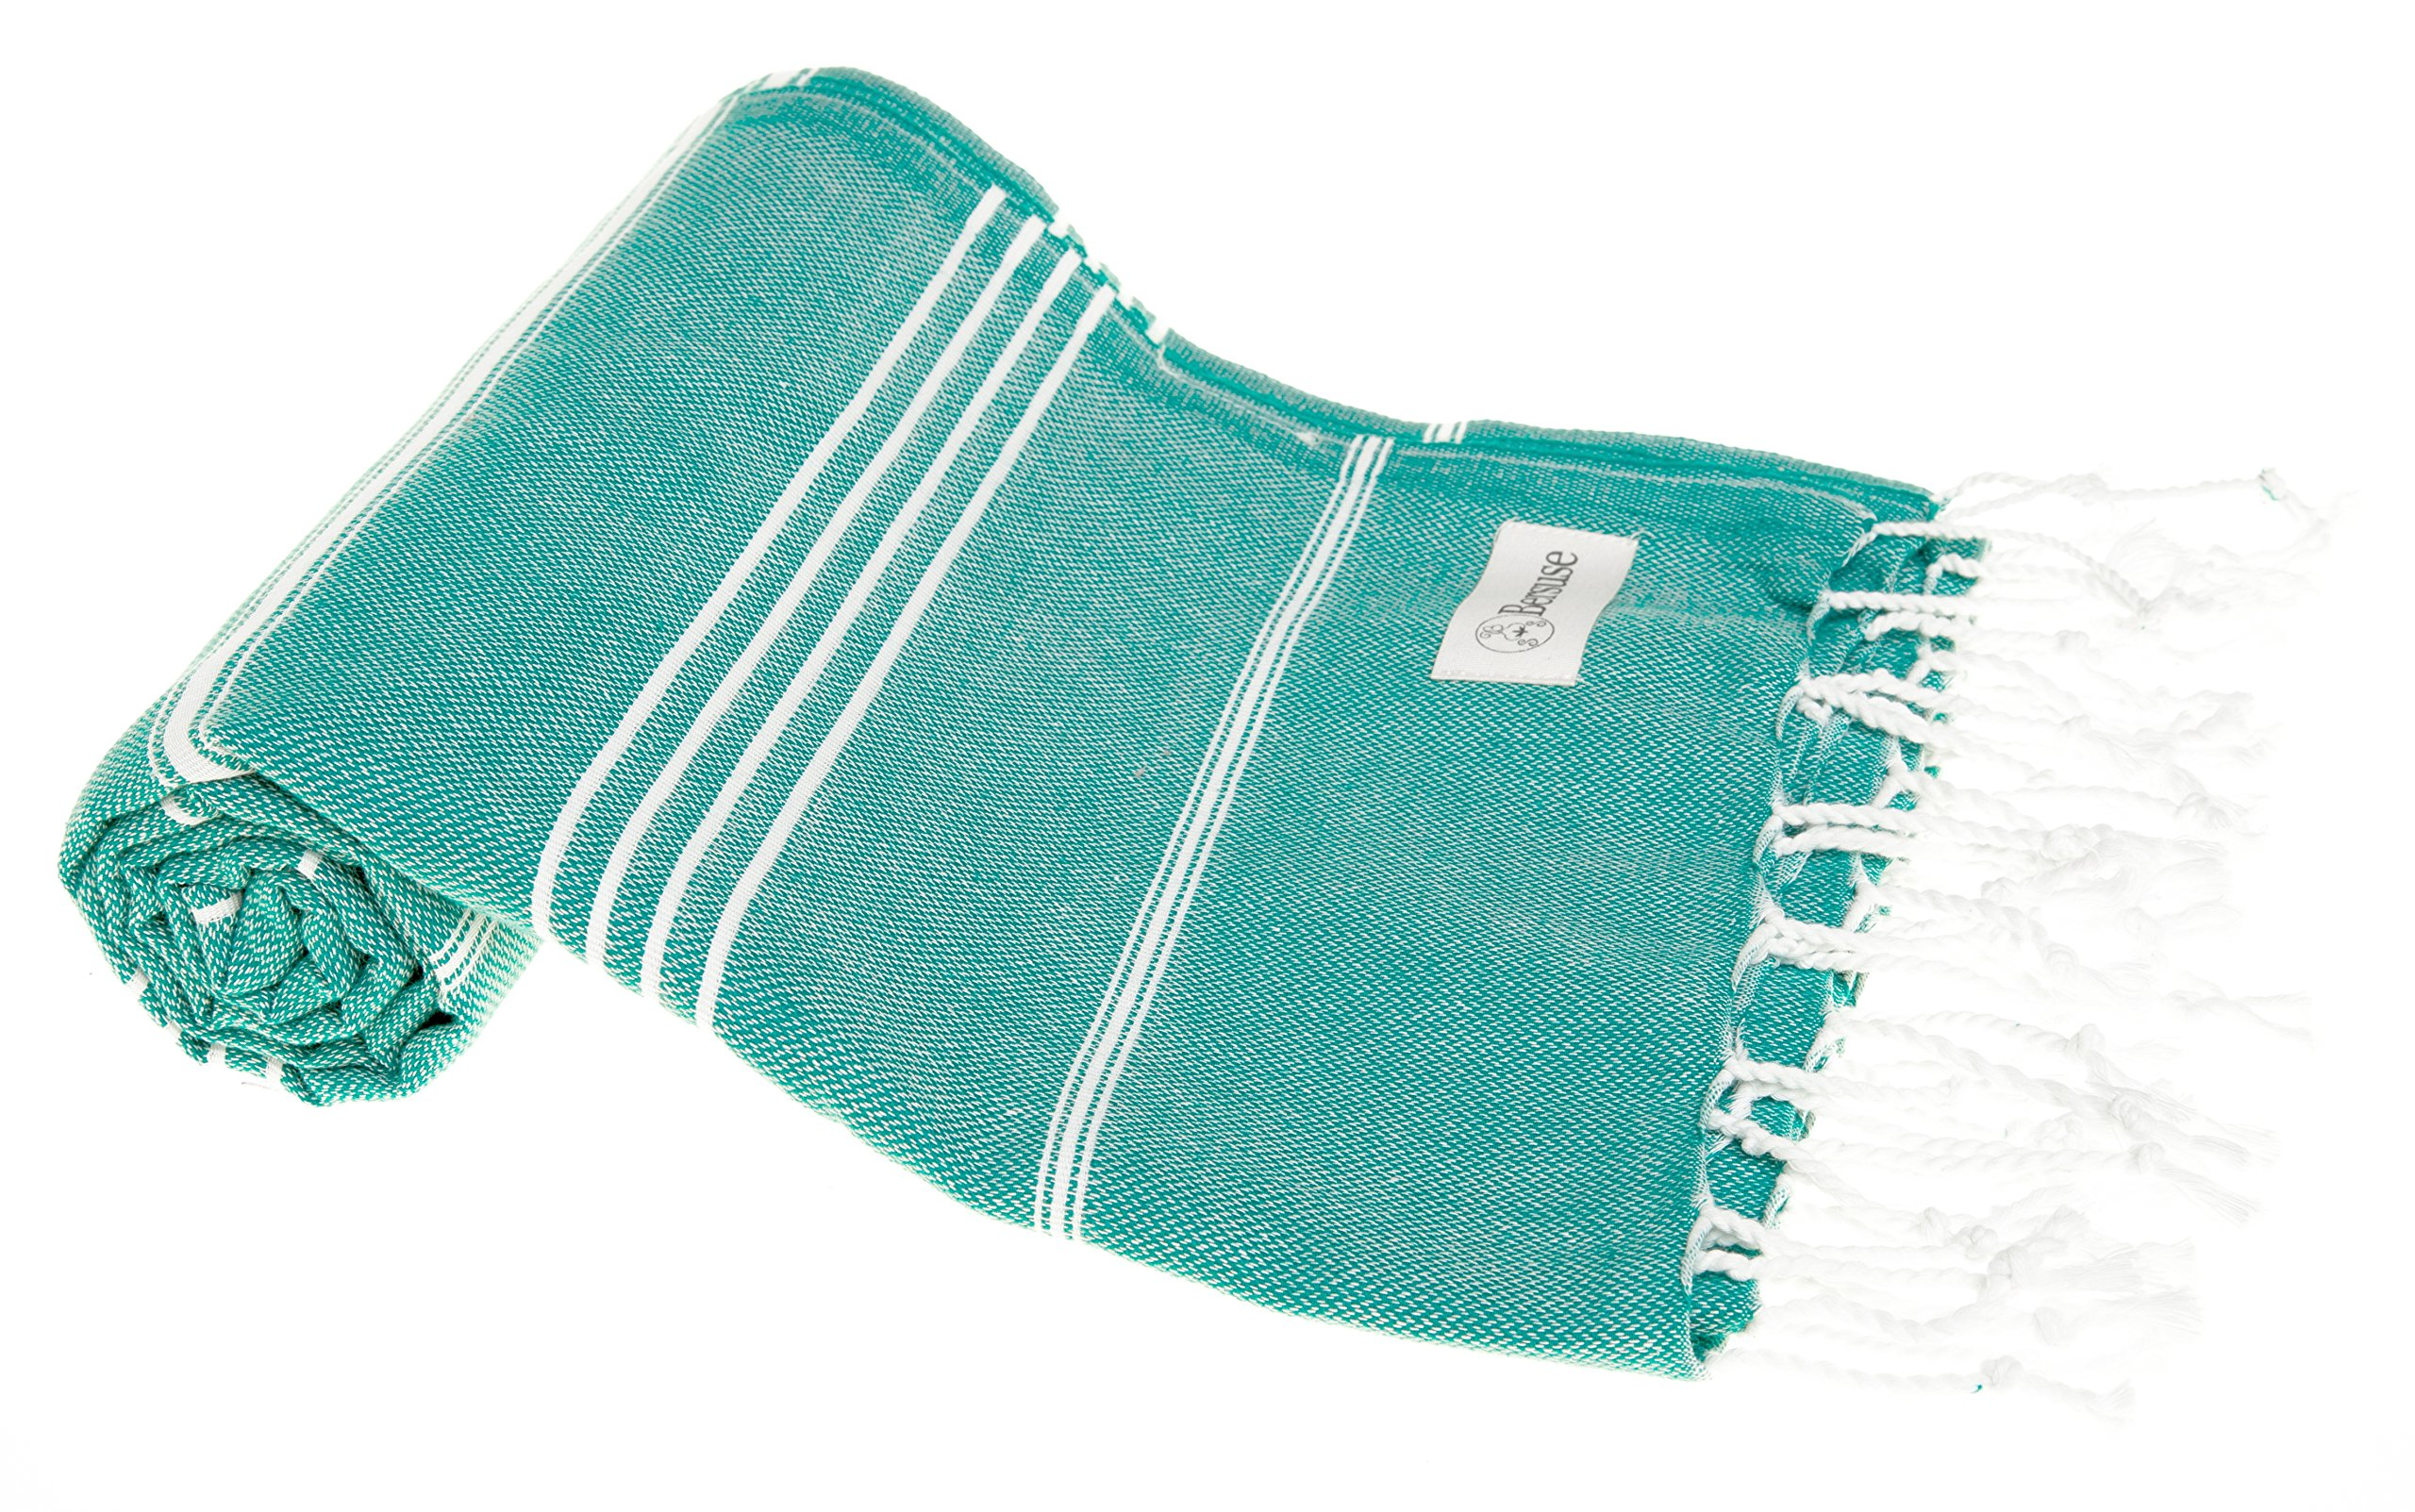 Bersuse 100% Cotton - Anatolia Turkish Towel - Bath Beach Fouta Peshtemal - Classic Striped Pestemal - 37X70 Inches, Teal